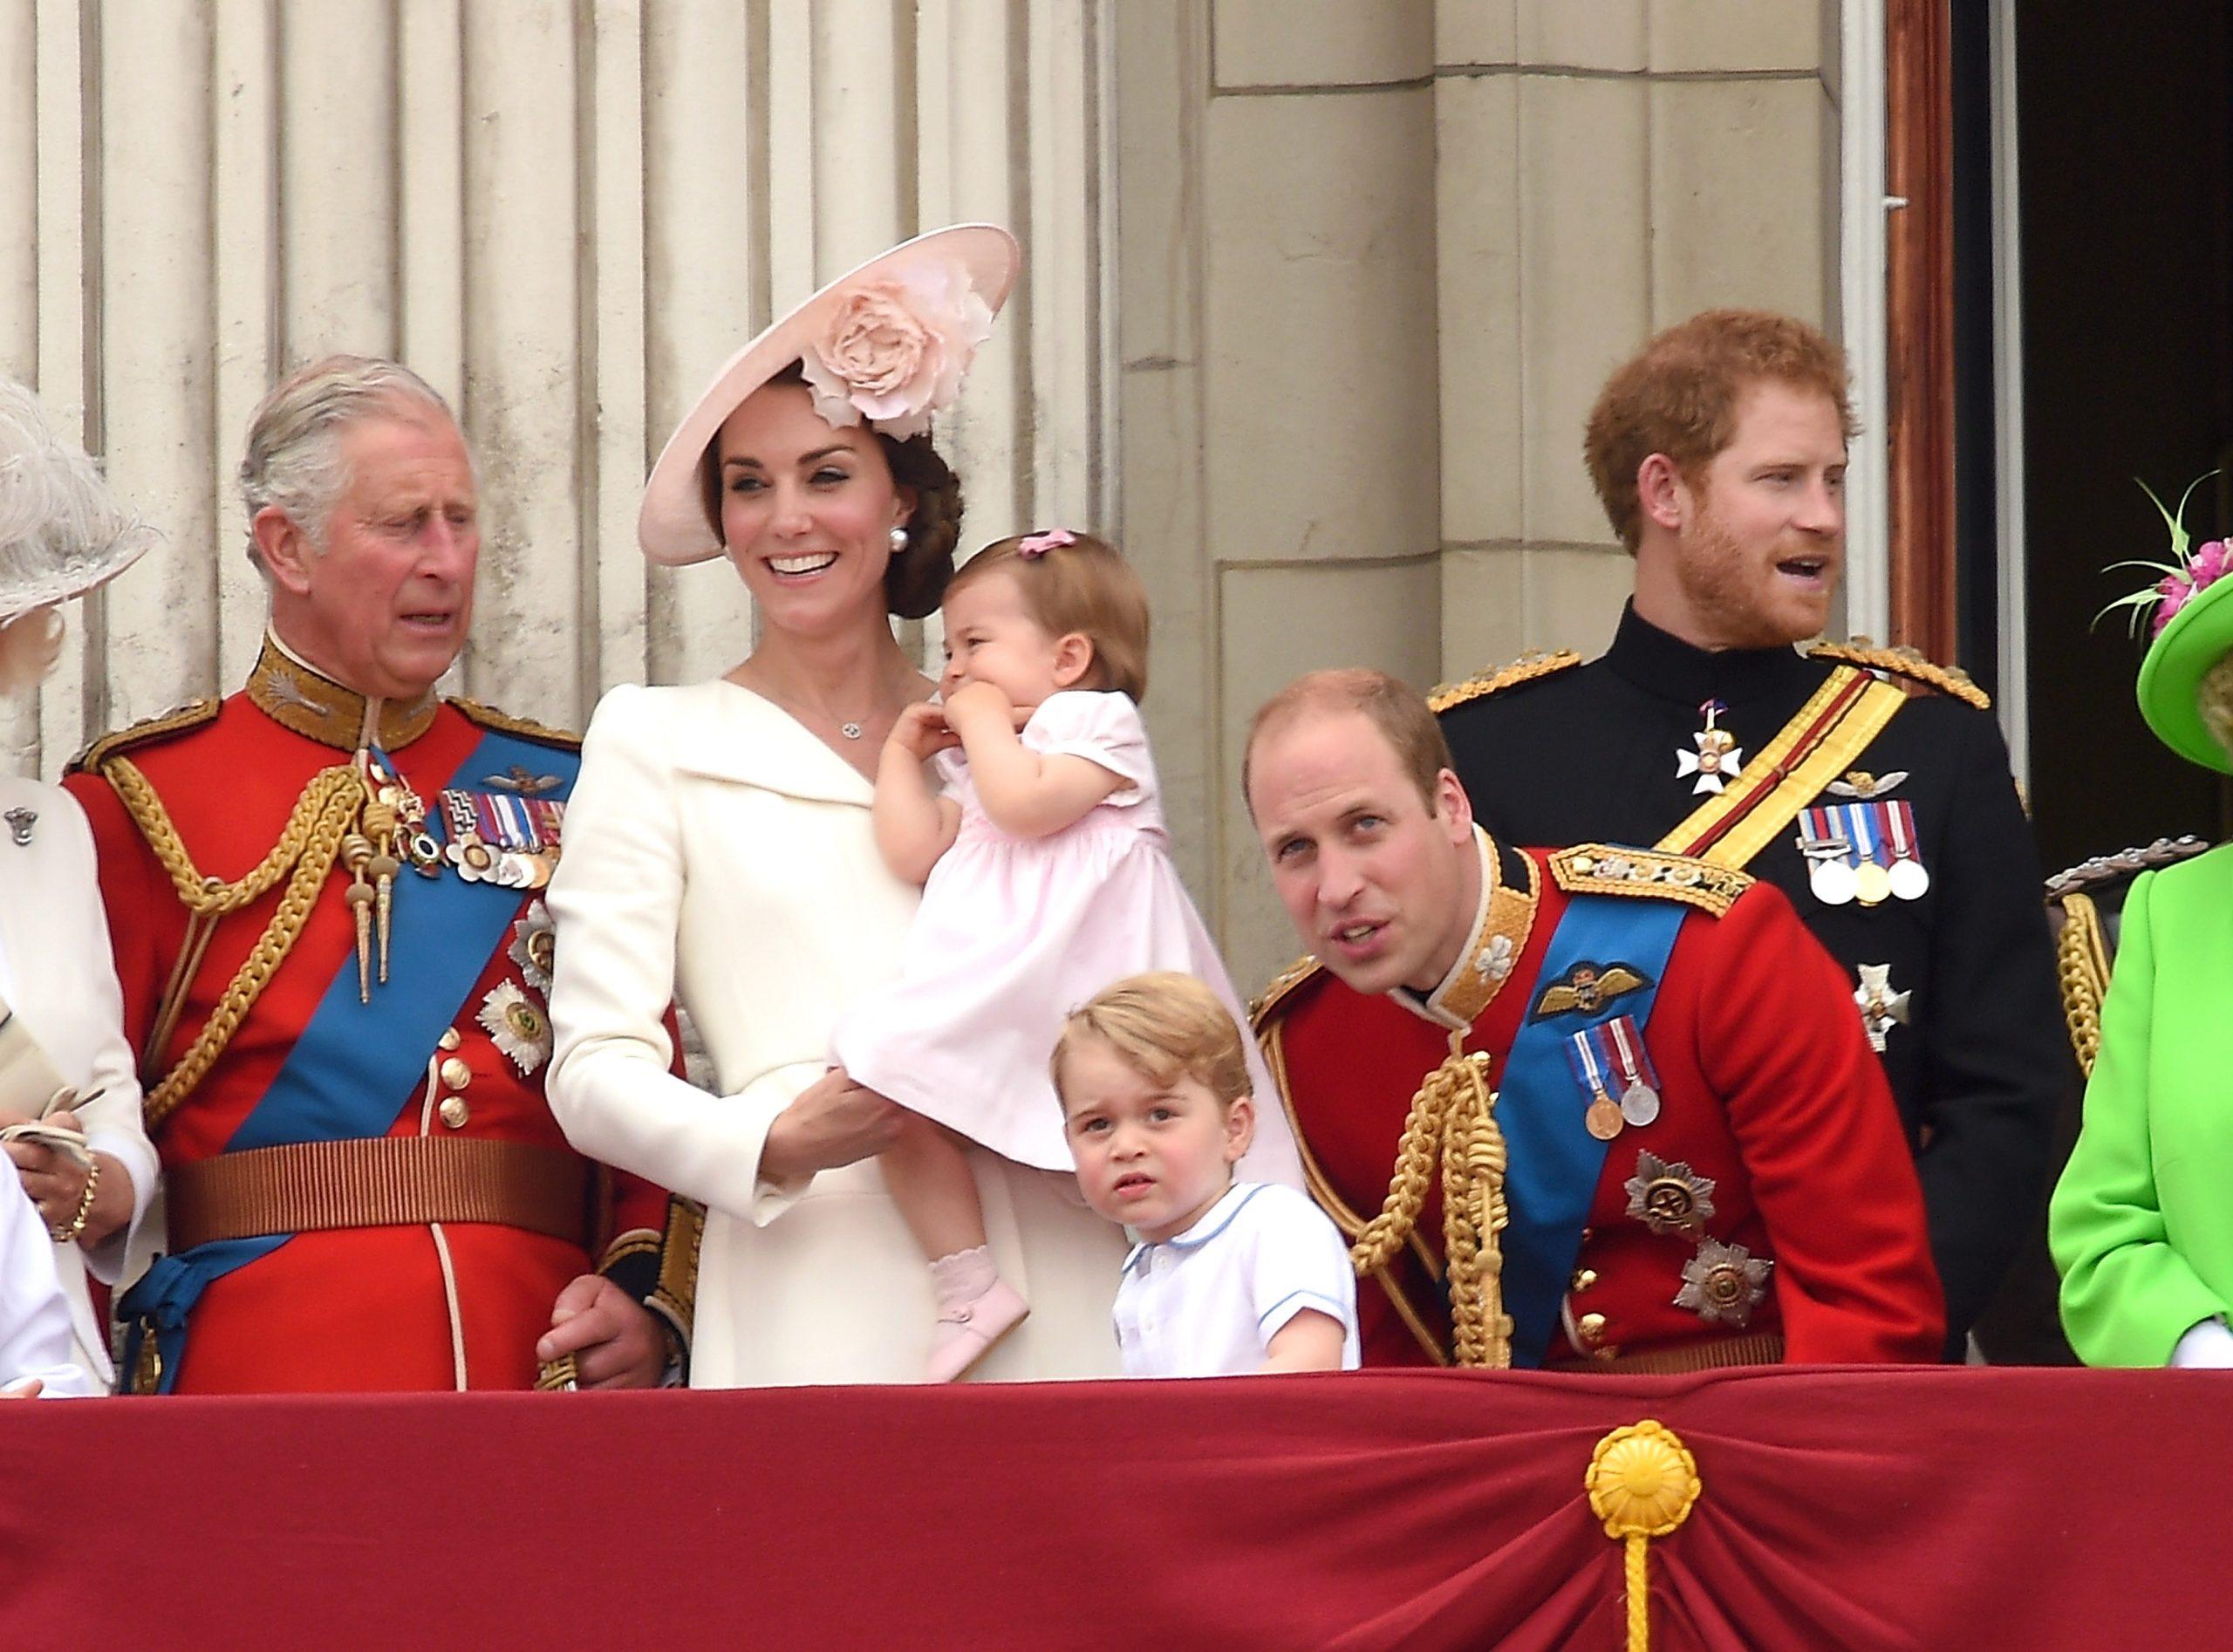 Le Prince Charles avec le Prince William, Kate Middleton et leurs enfants Prince George et Charlotte.